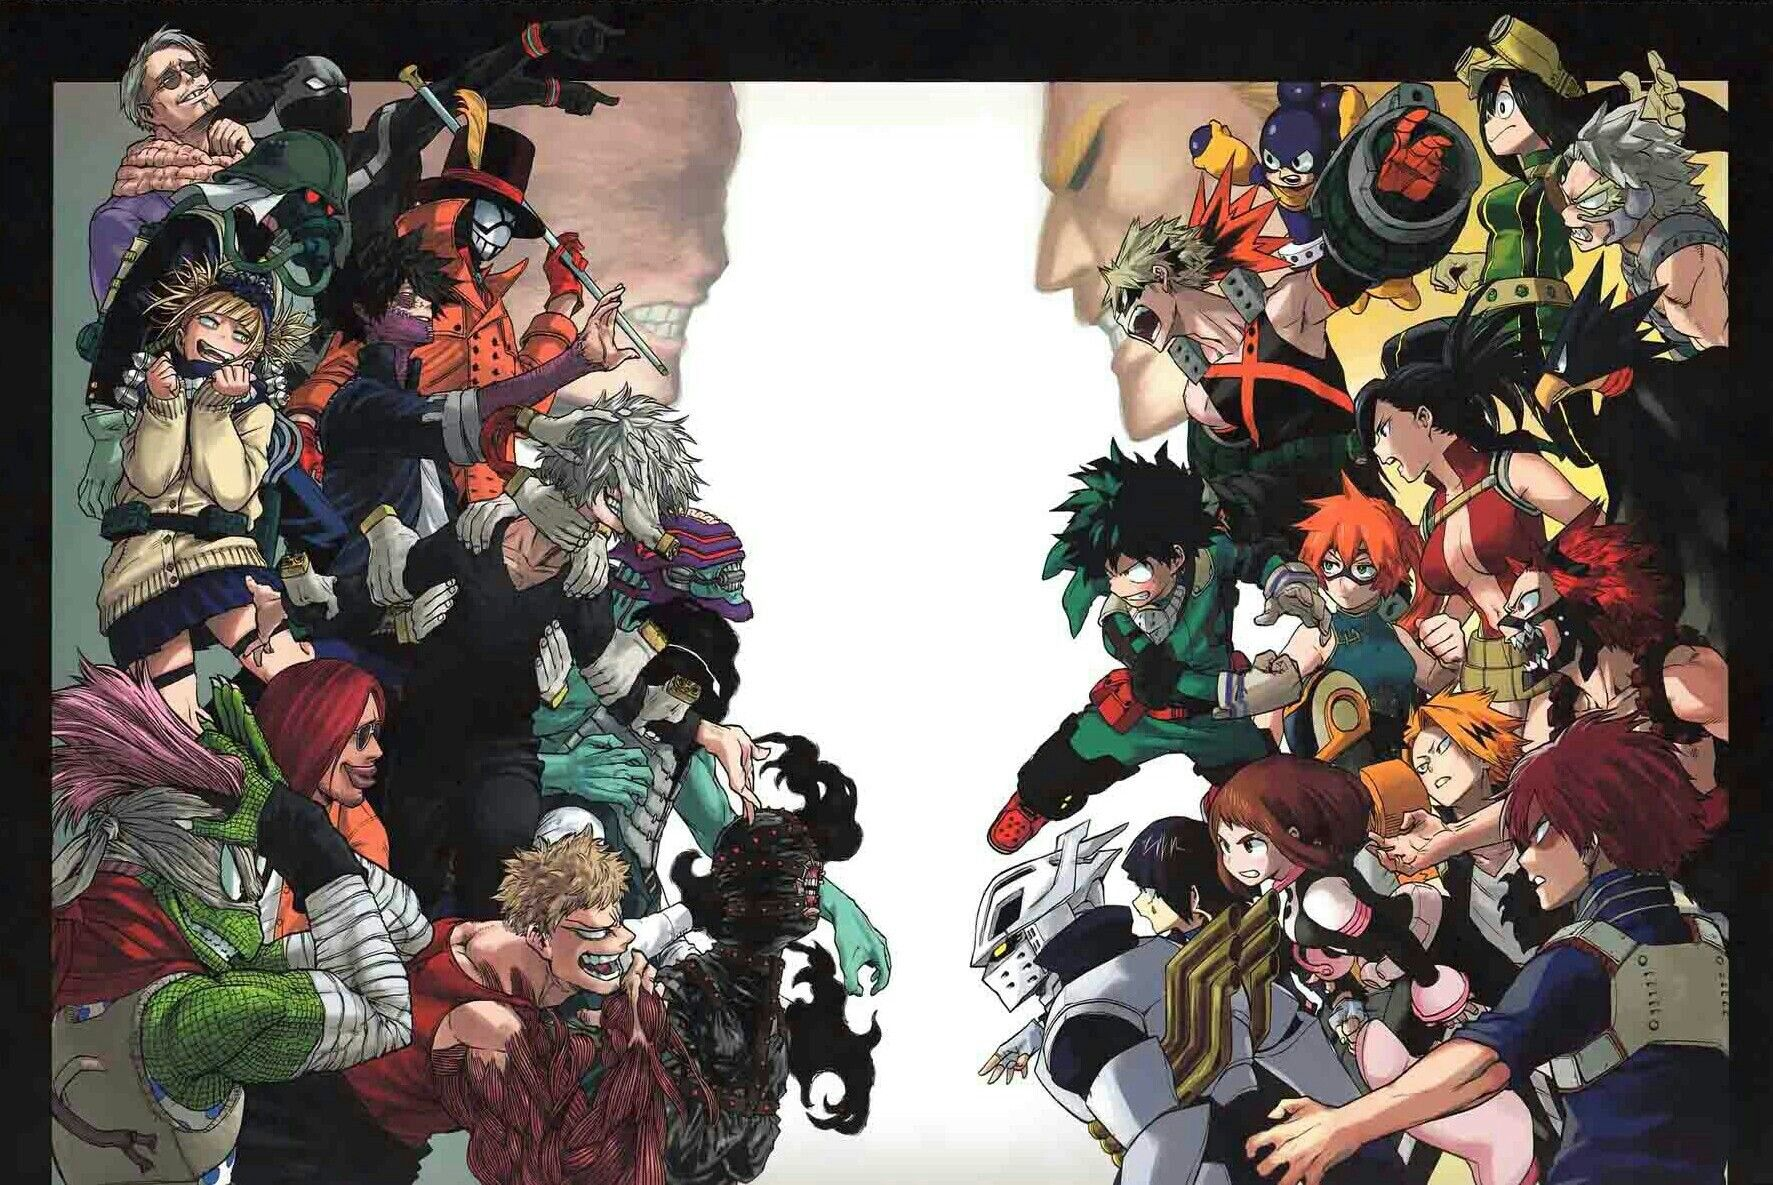 Check out this fantastic collection of my hero academia villains wallpapers,. Heroes vs. Villains | Boku no hero academia, My hero ...